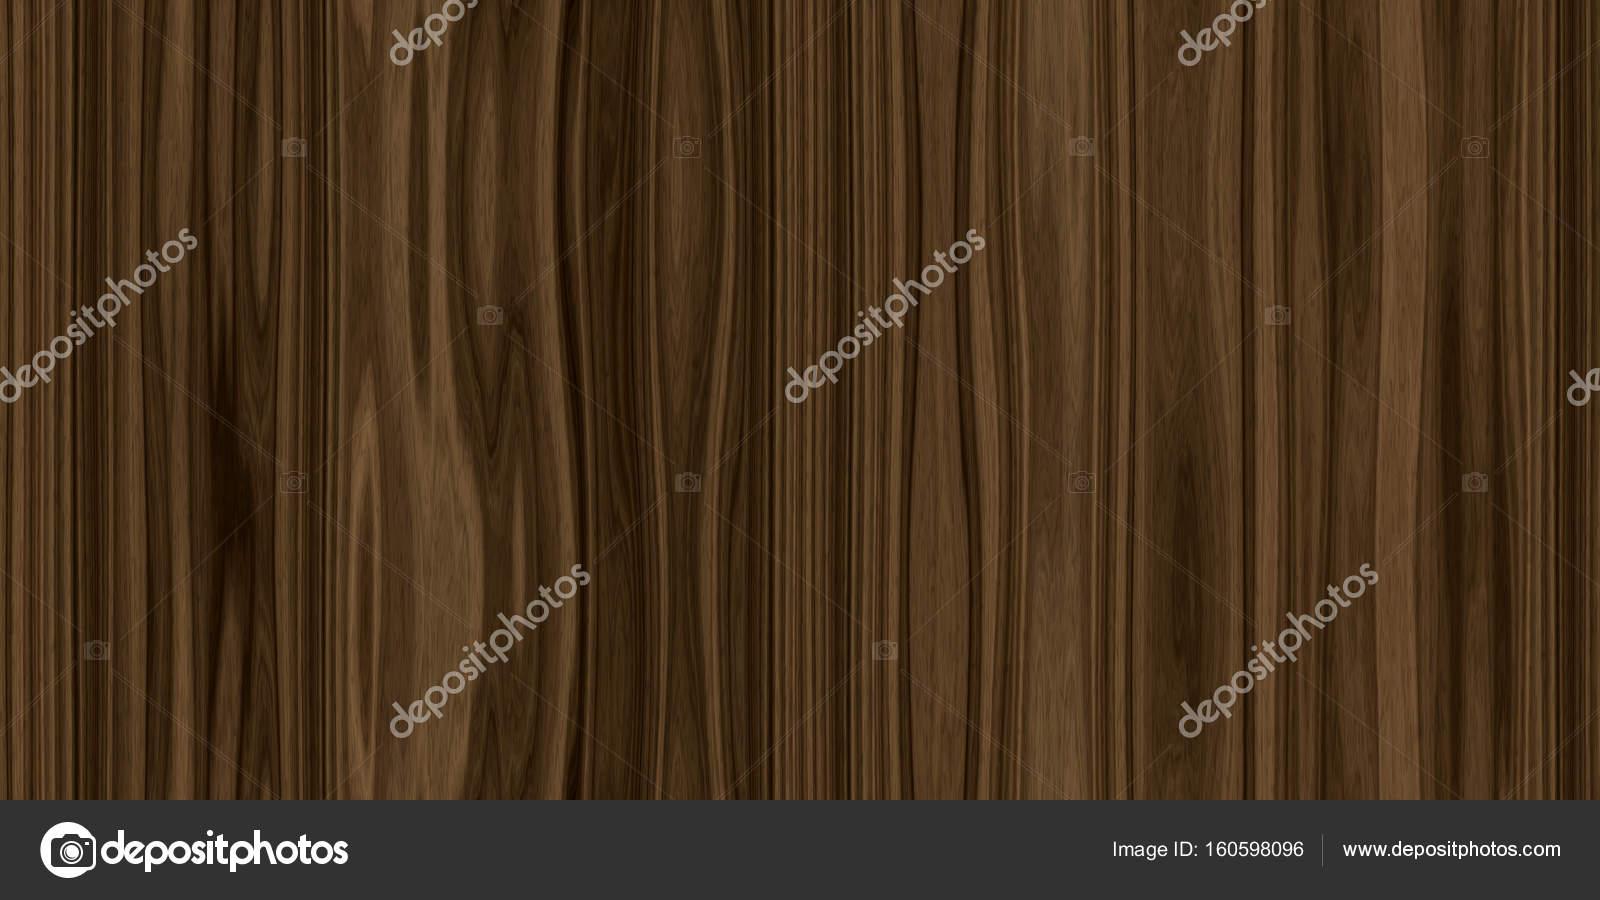 Assi Di Legno Hd : Texture ripetuta priorità bassa senza giunte di legno noce u foto